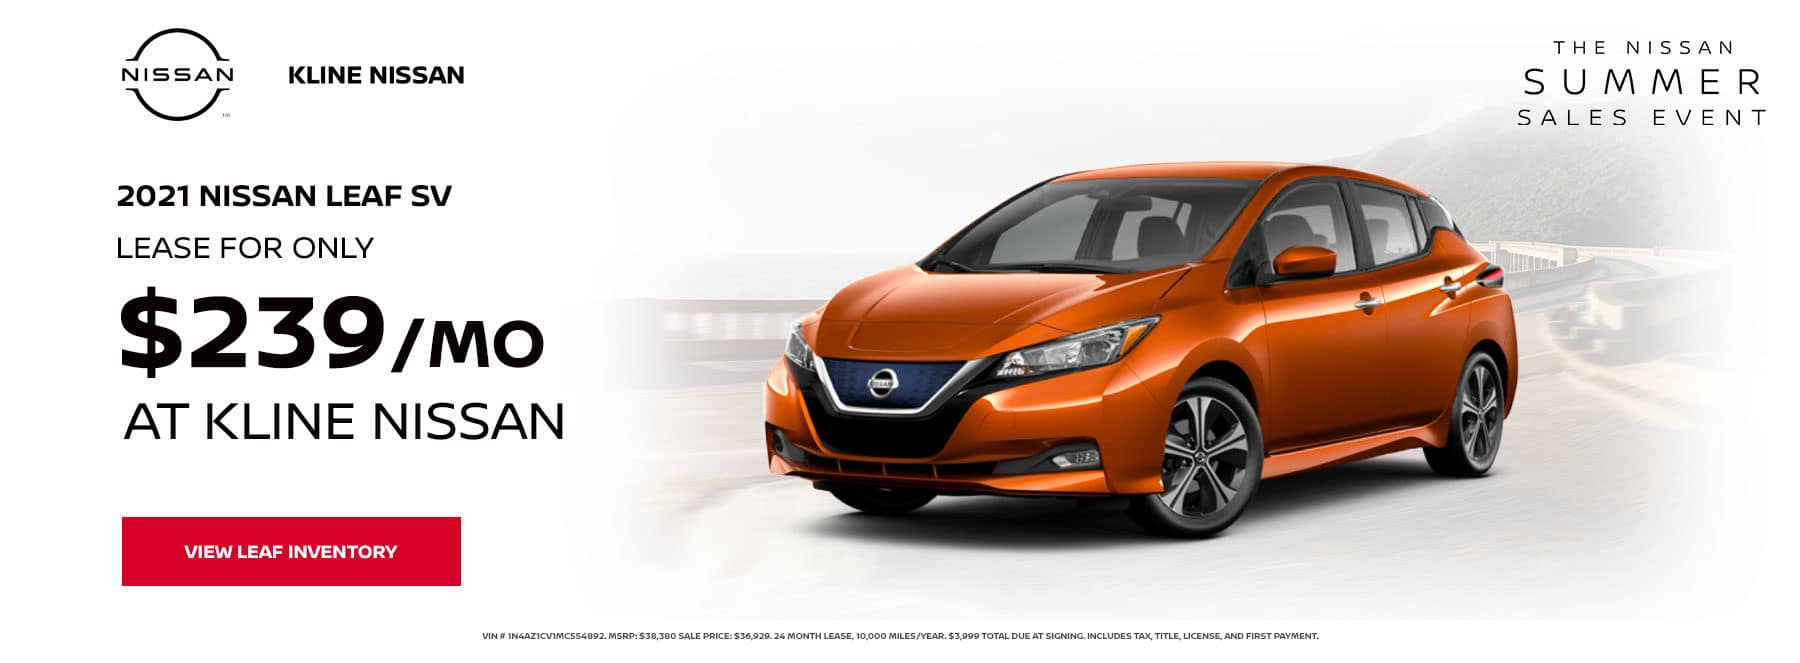 Lease a 2021 Nissan Leaf SV, for only $239/mo at Kline Nissan